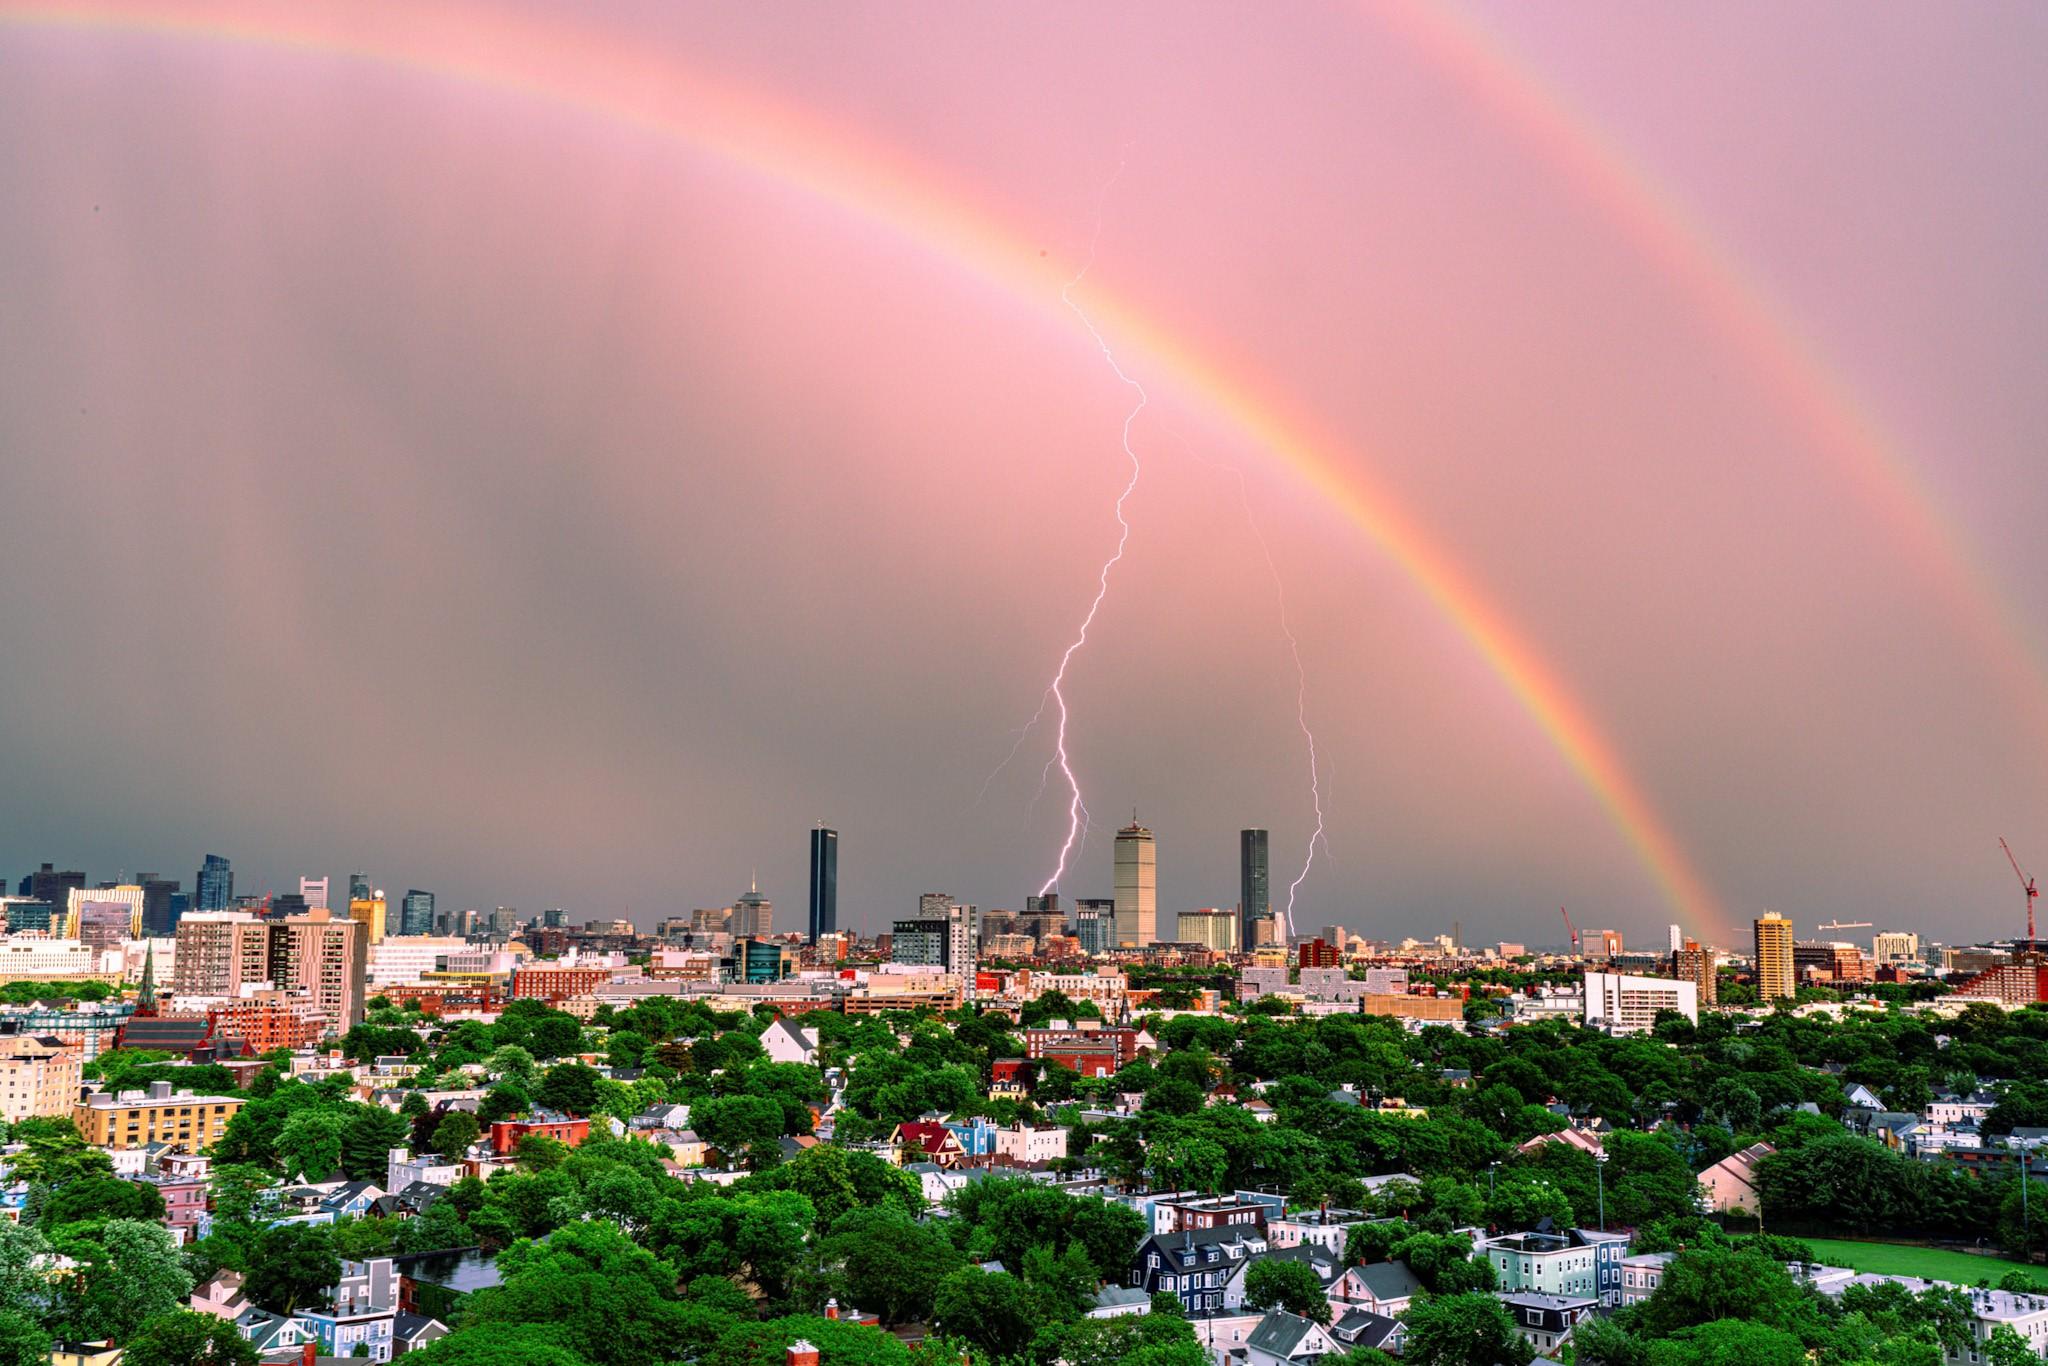 double rainbow and lightning over Boston skyline